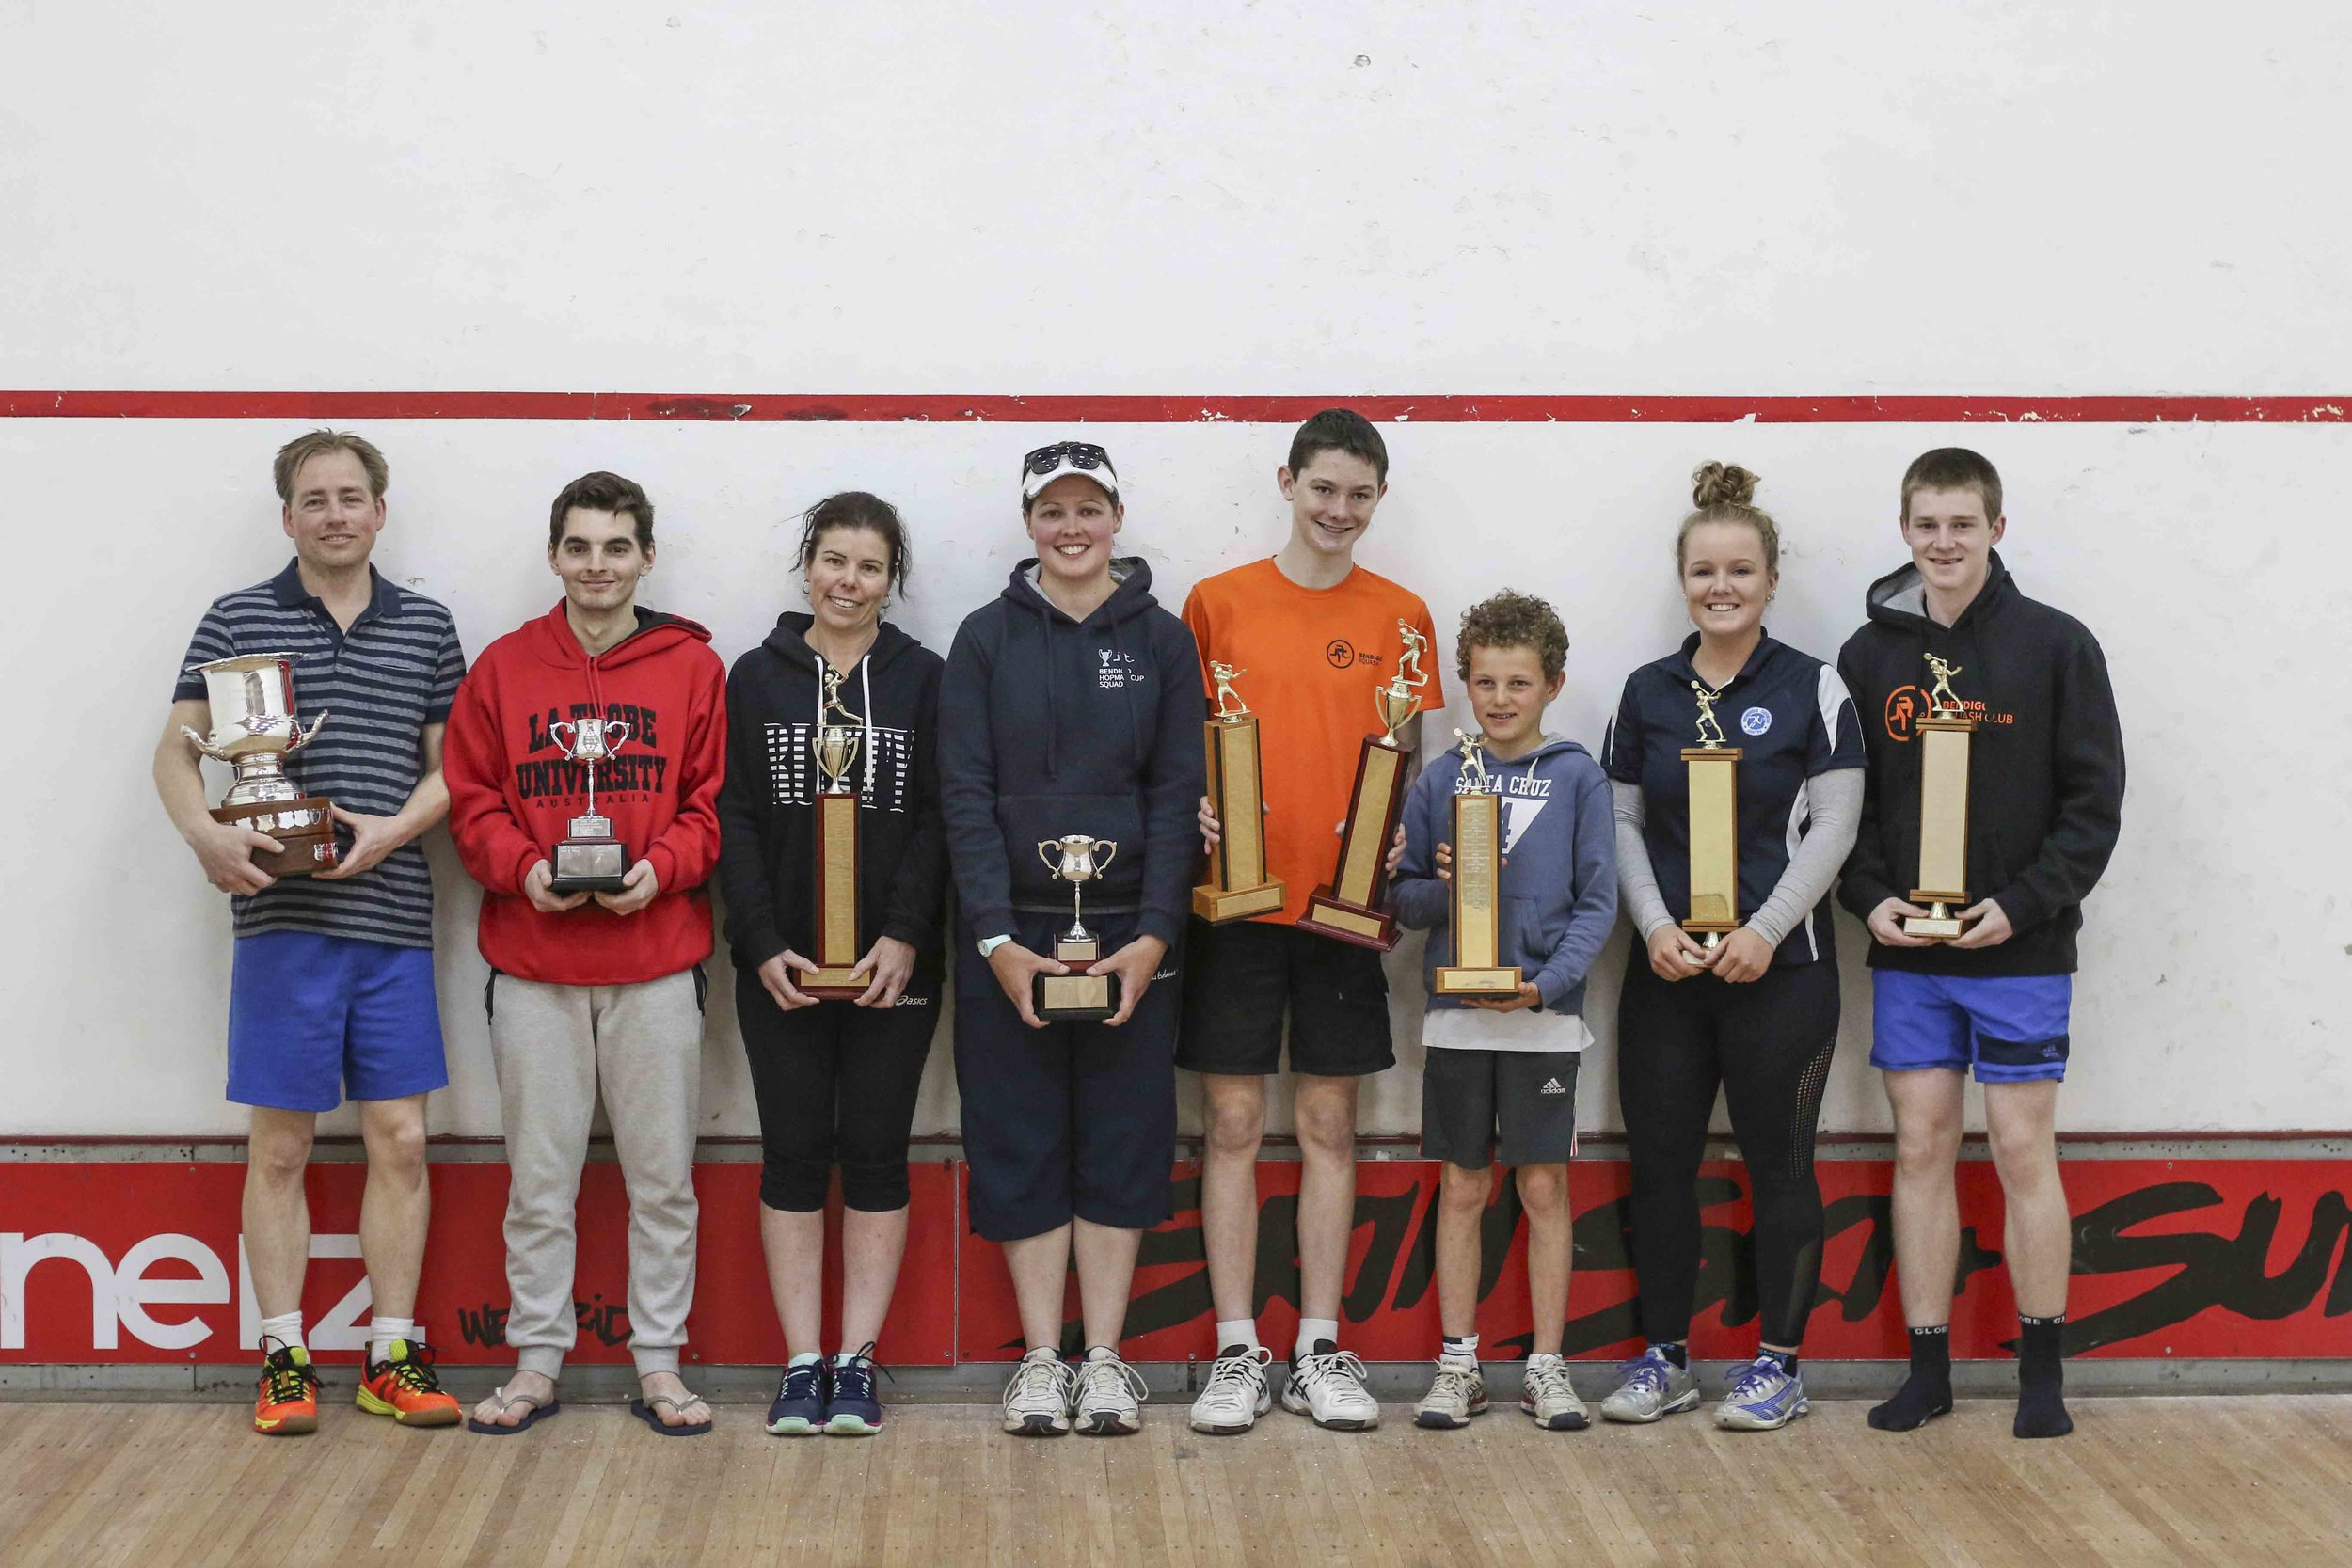 Bendigo Squash Club Championships 2016